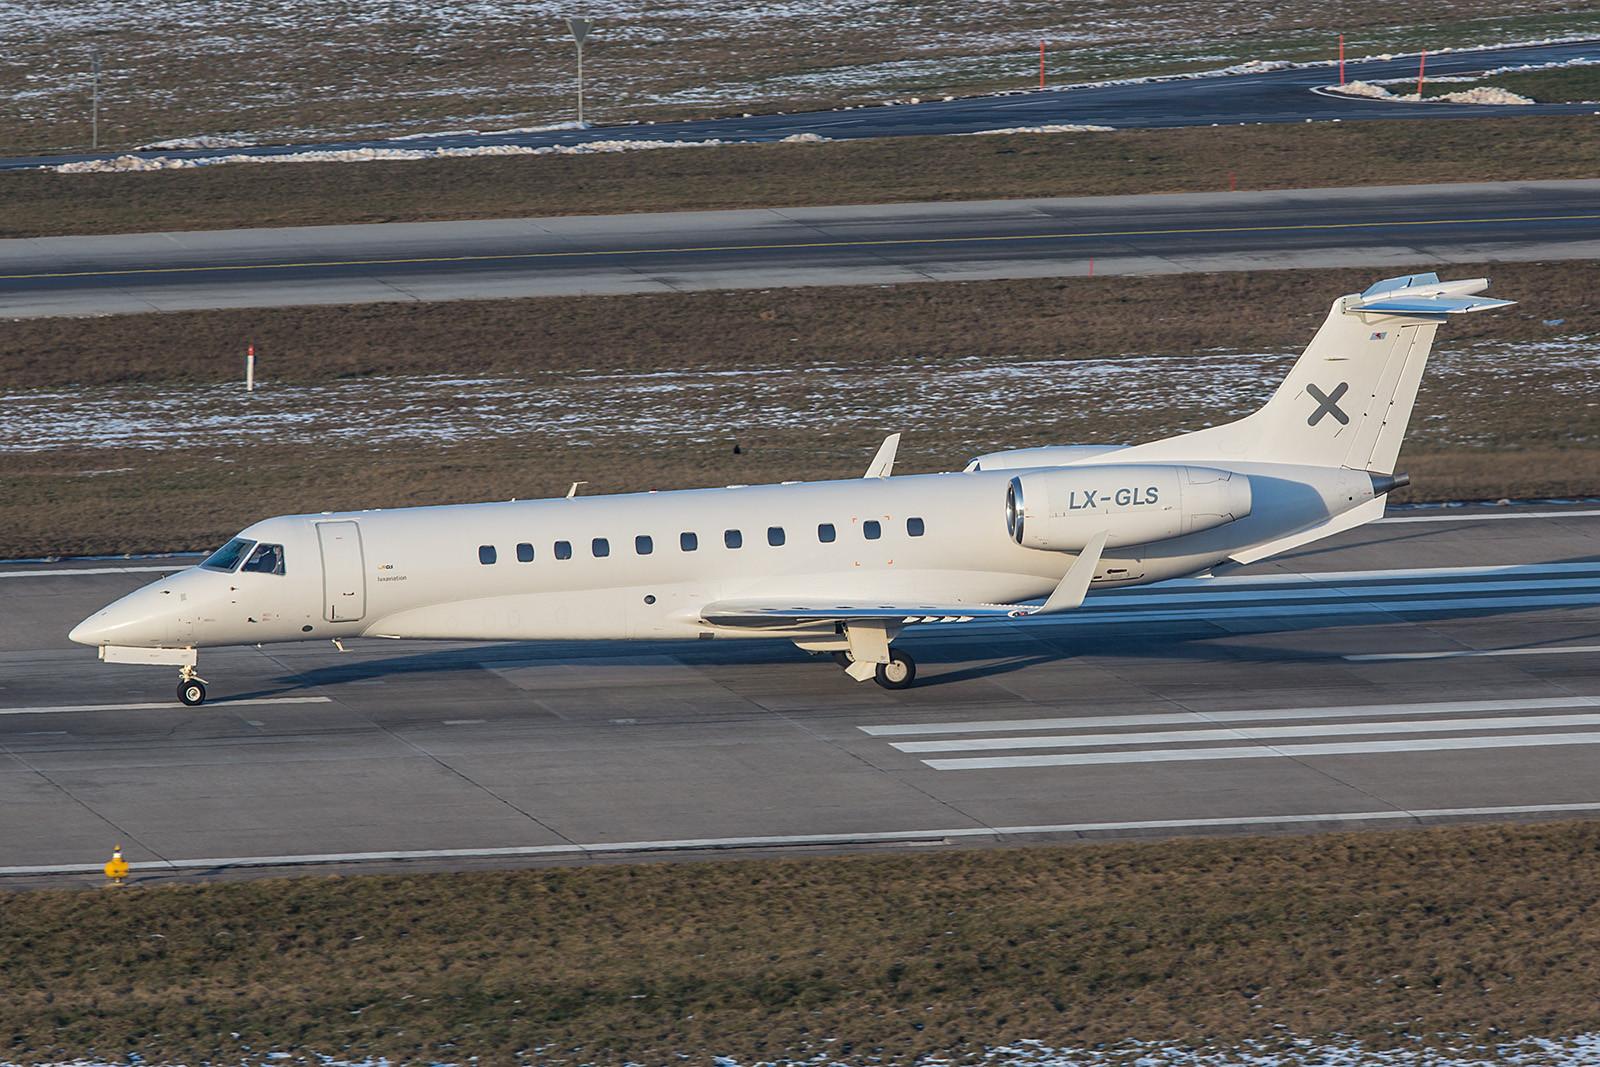 LX-GLS; Luxaviation Embraer EMB-135BJ Legacy